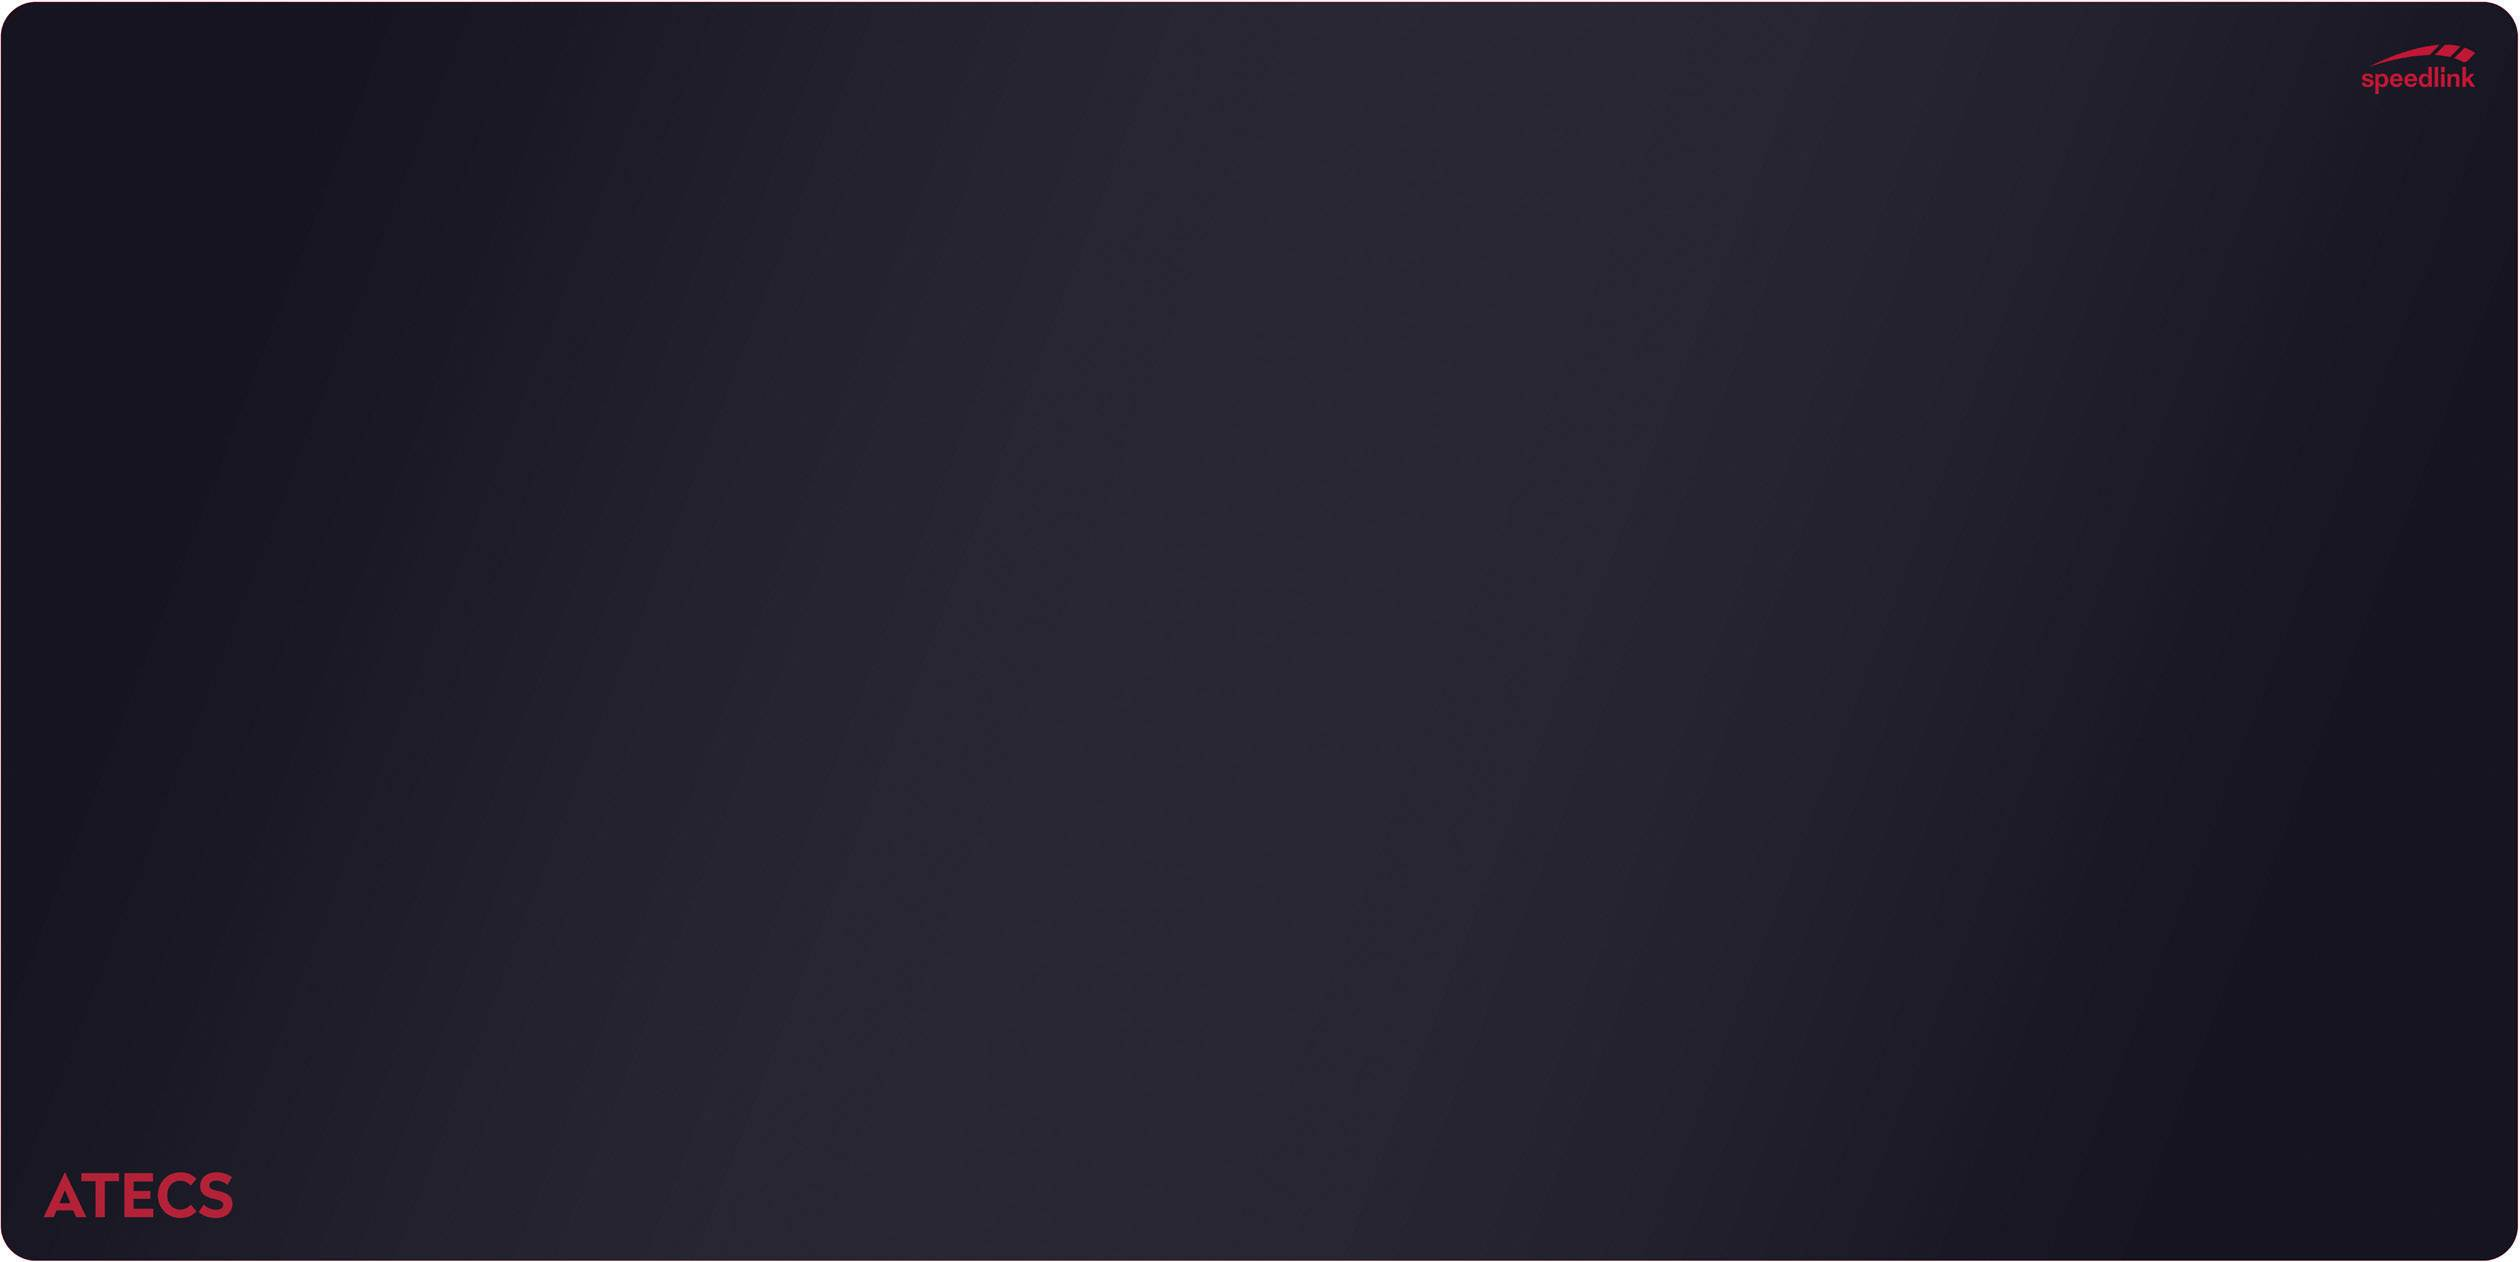 SPEEDLINK ATECS Soft Gaming Mousepad Mauspad Schwarz Size M